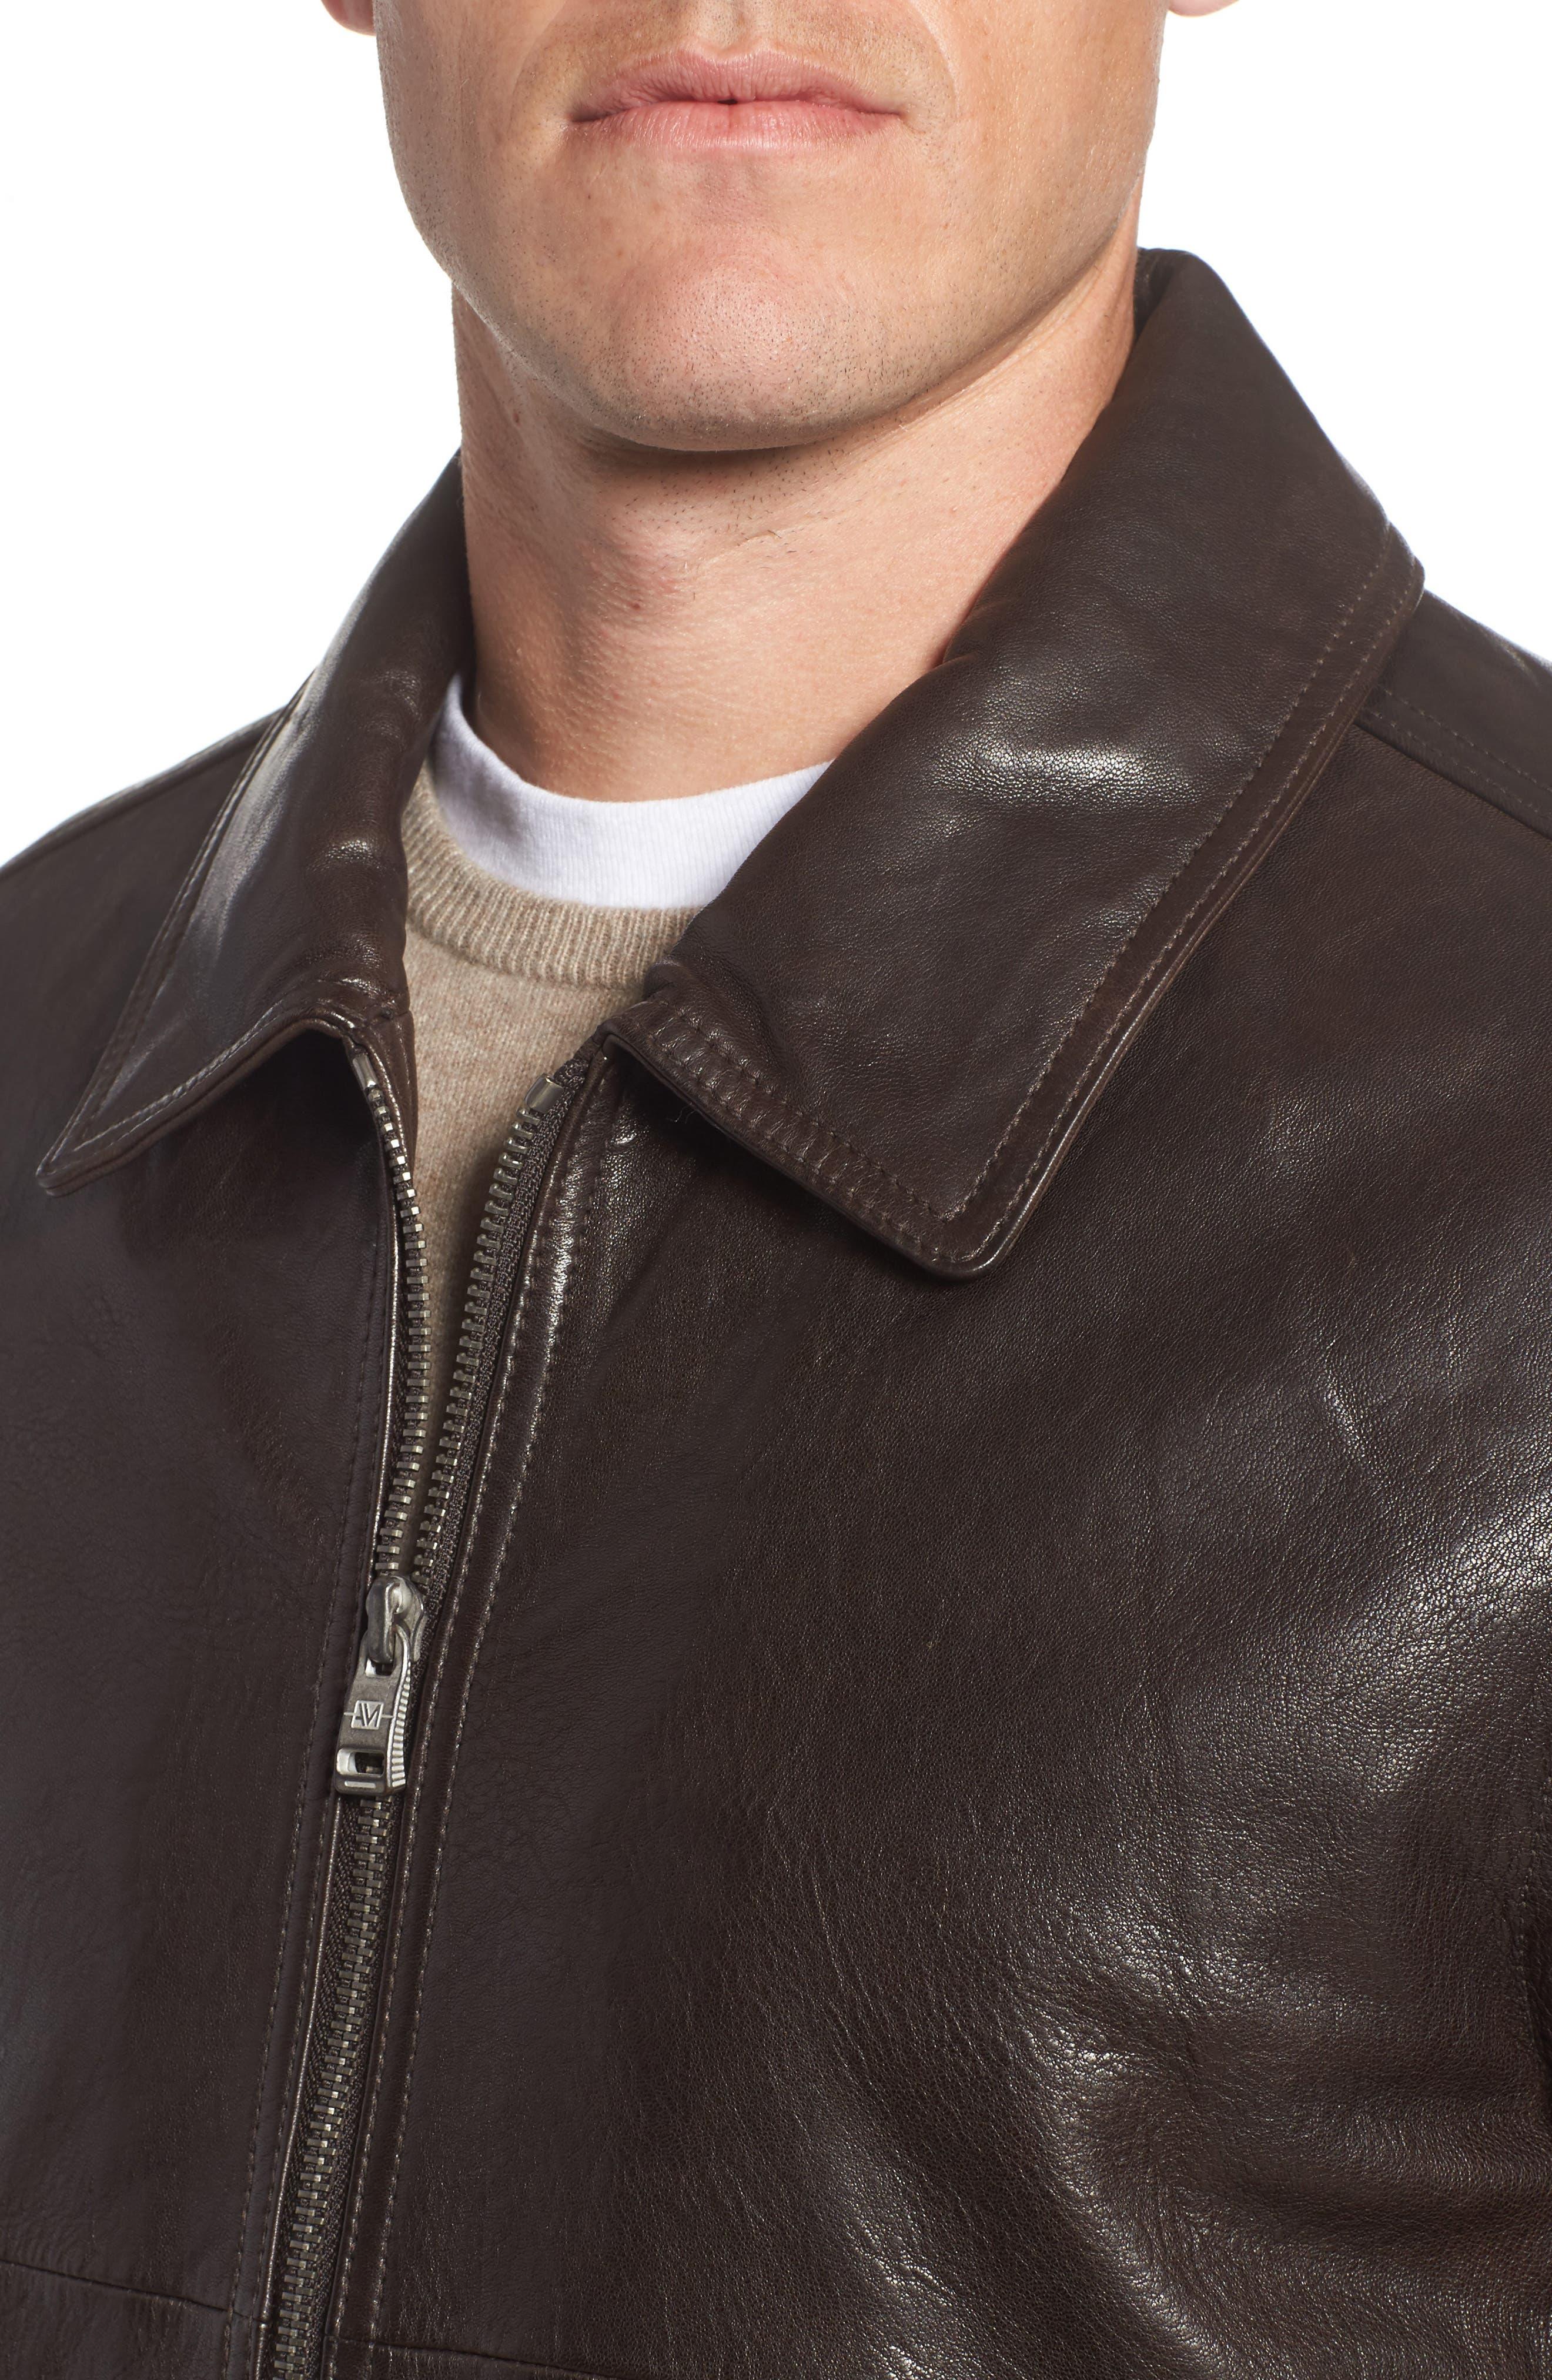 Morrison Spread Collar Leather Jacket,                             Alternate thumbnail 4, color,                             200